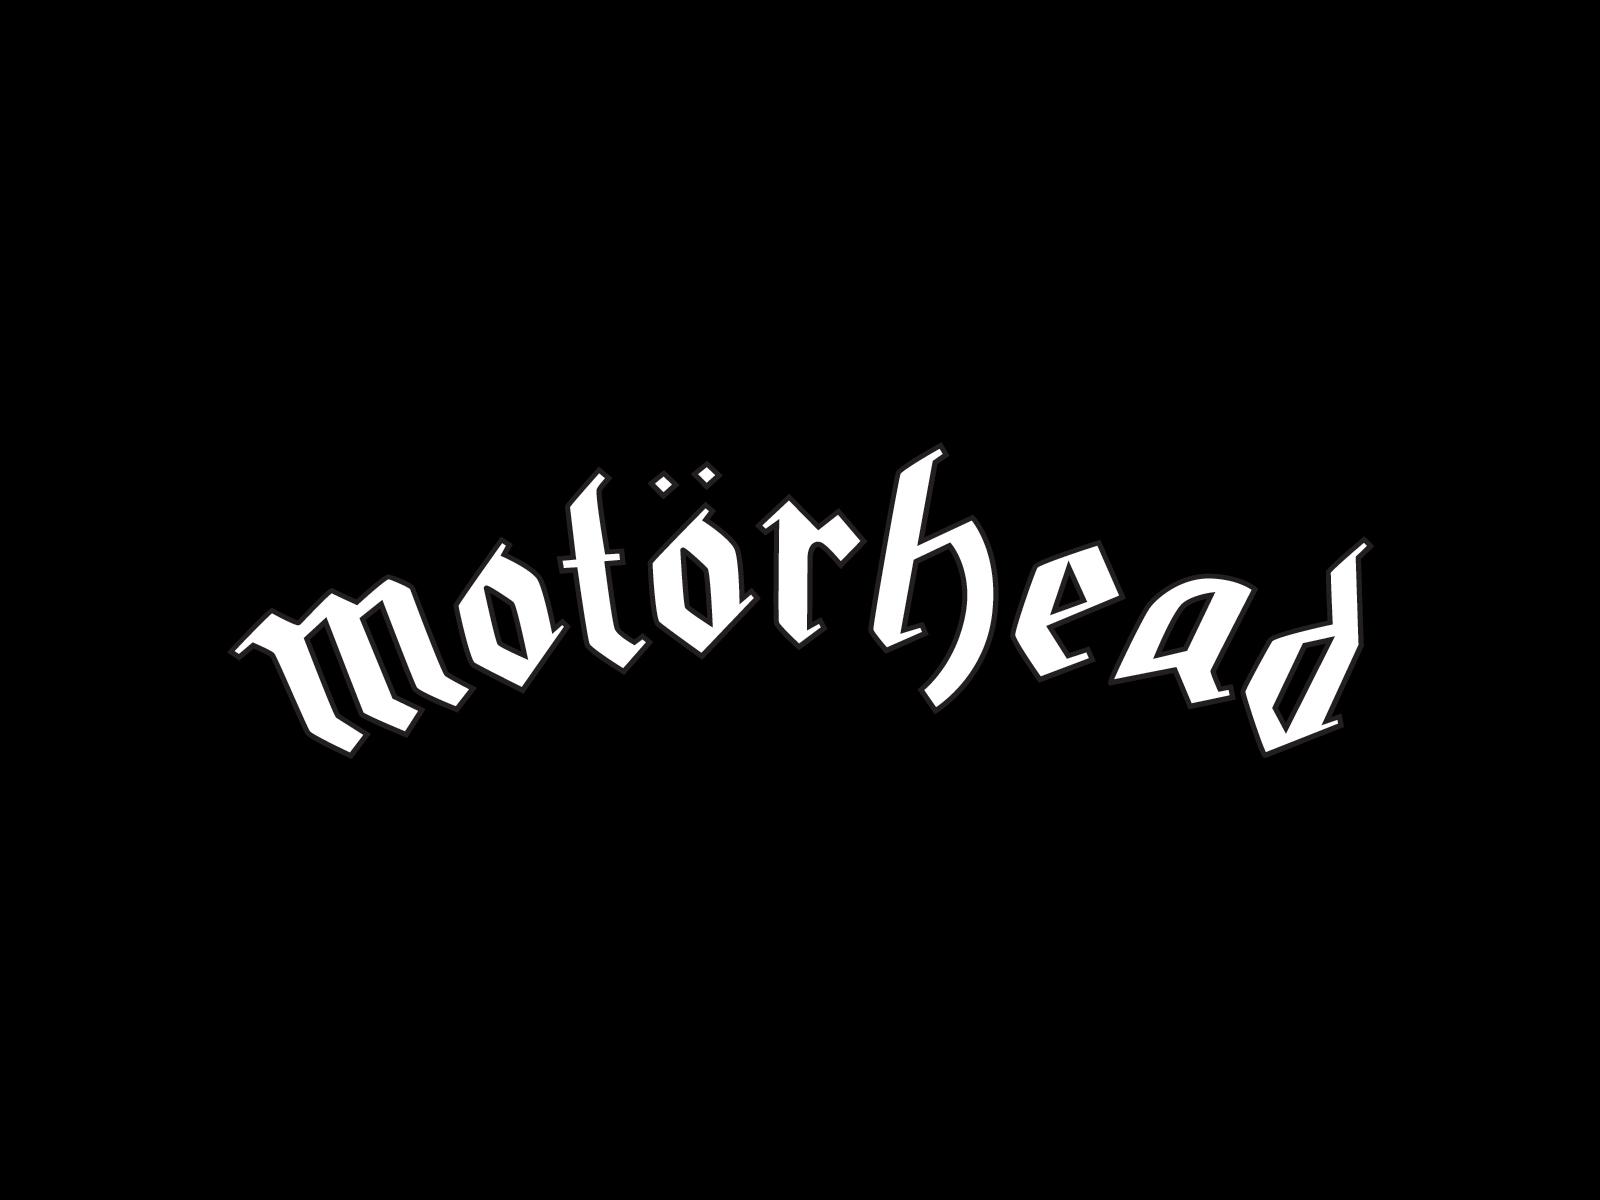 Motorhead logo wallpaper 1600x1200